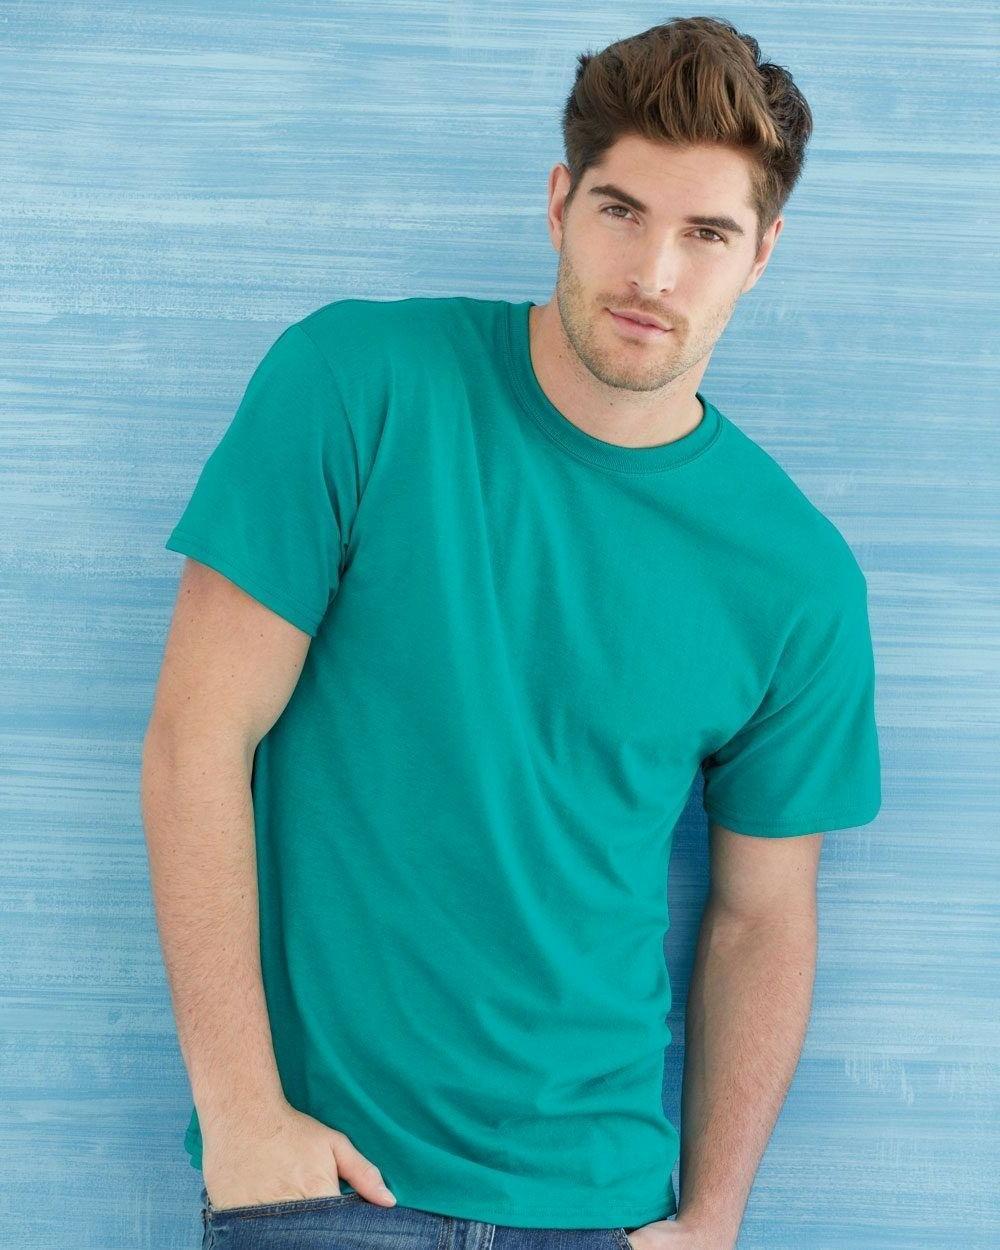 100 T-SHIRTS BLANK BULK LOTS Colors 100 Wholesale